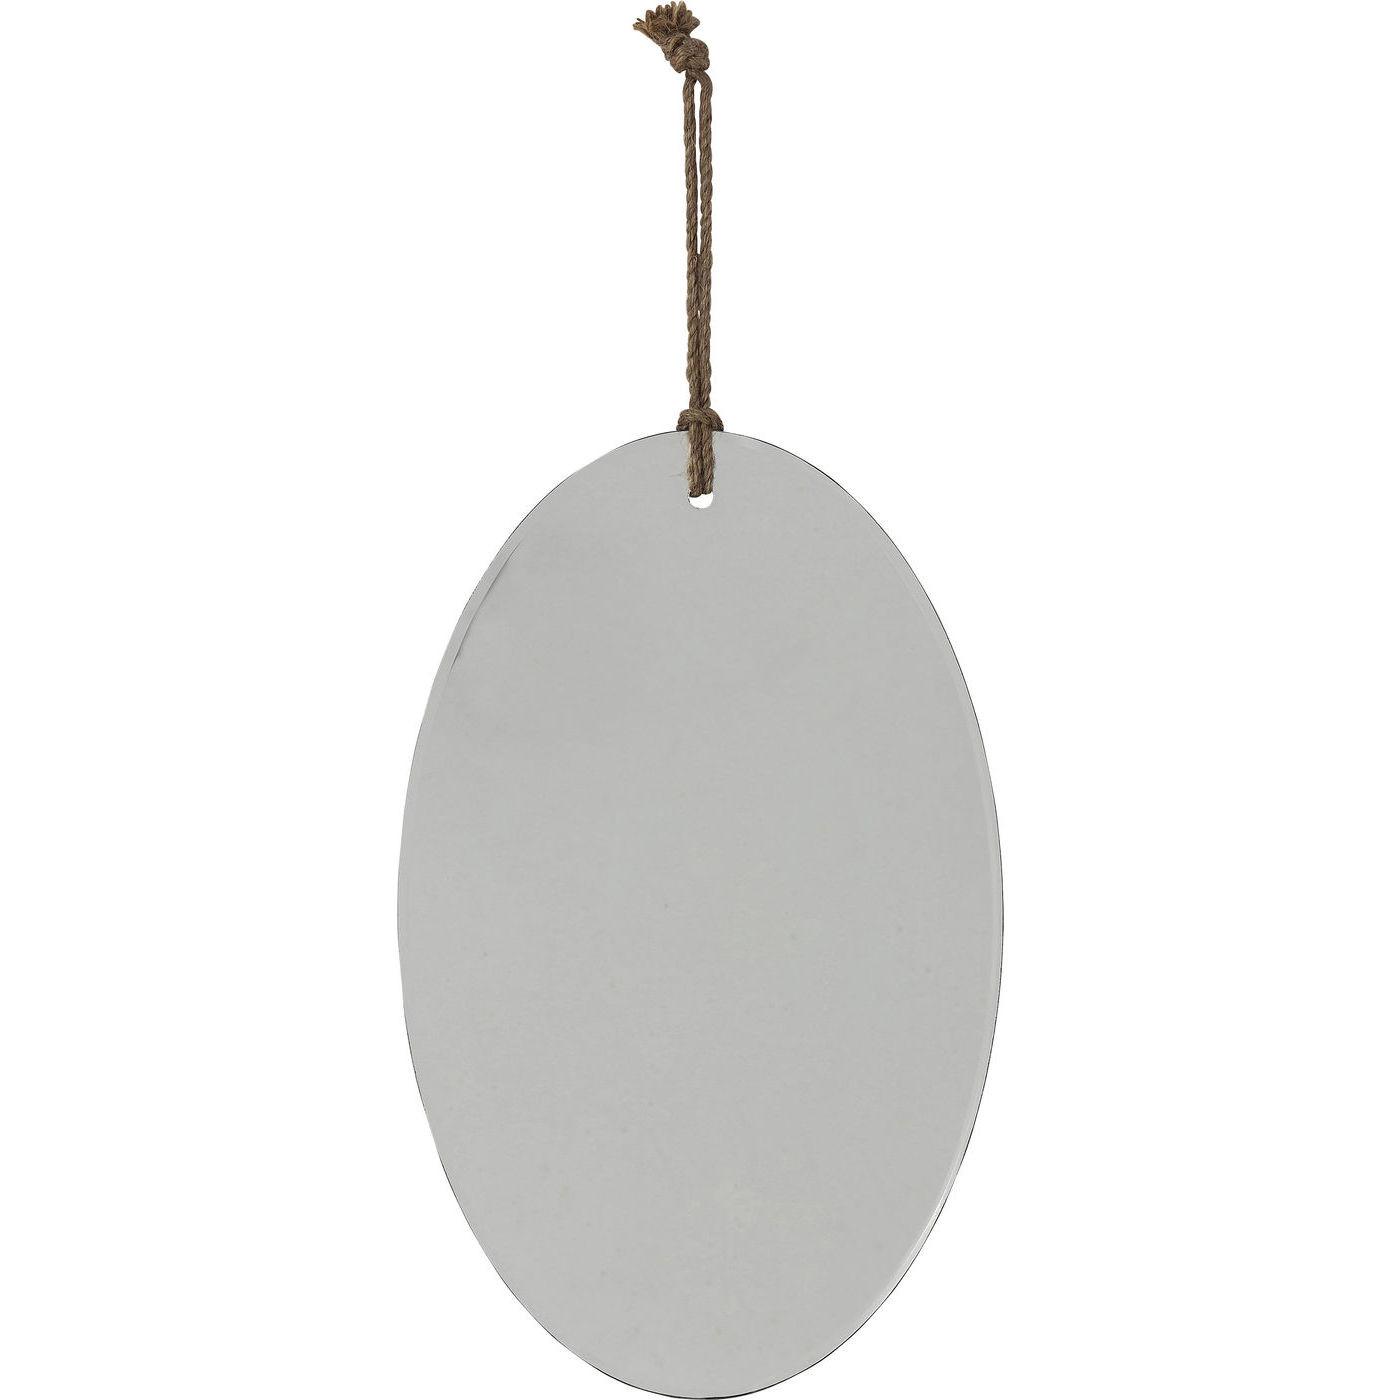 Kare design spiegel mutoni m bel for Kare design schweiz